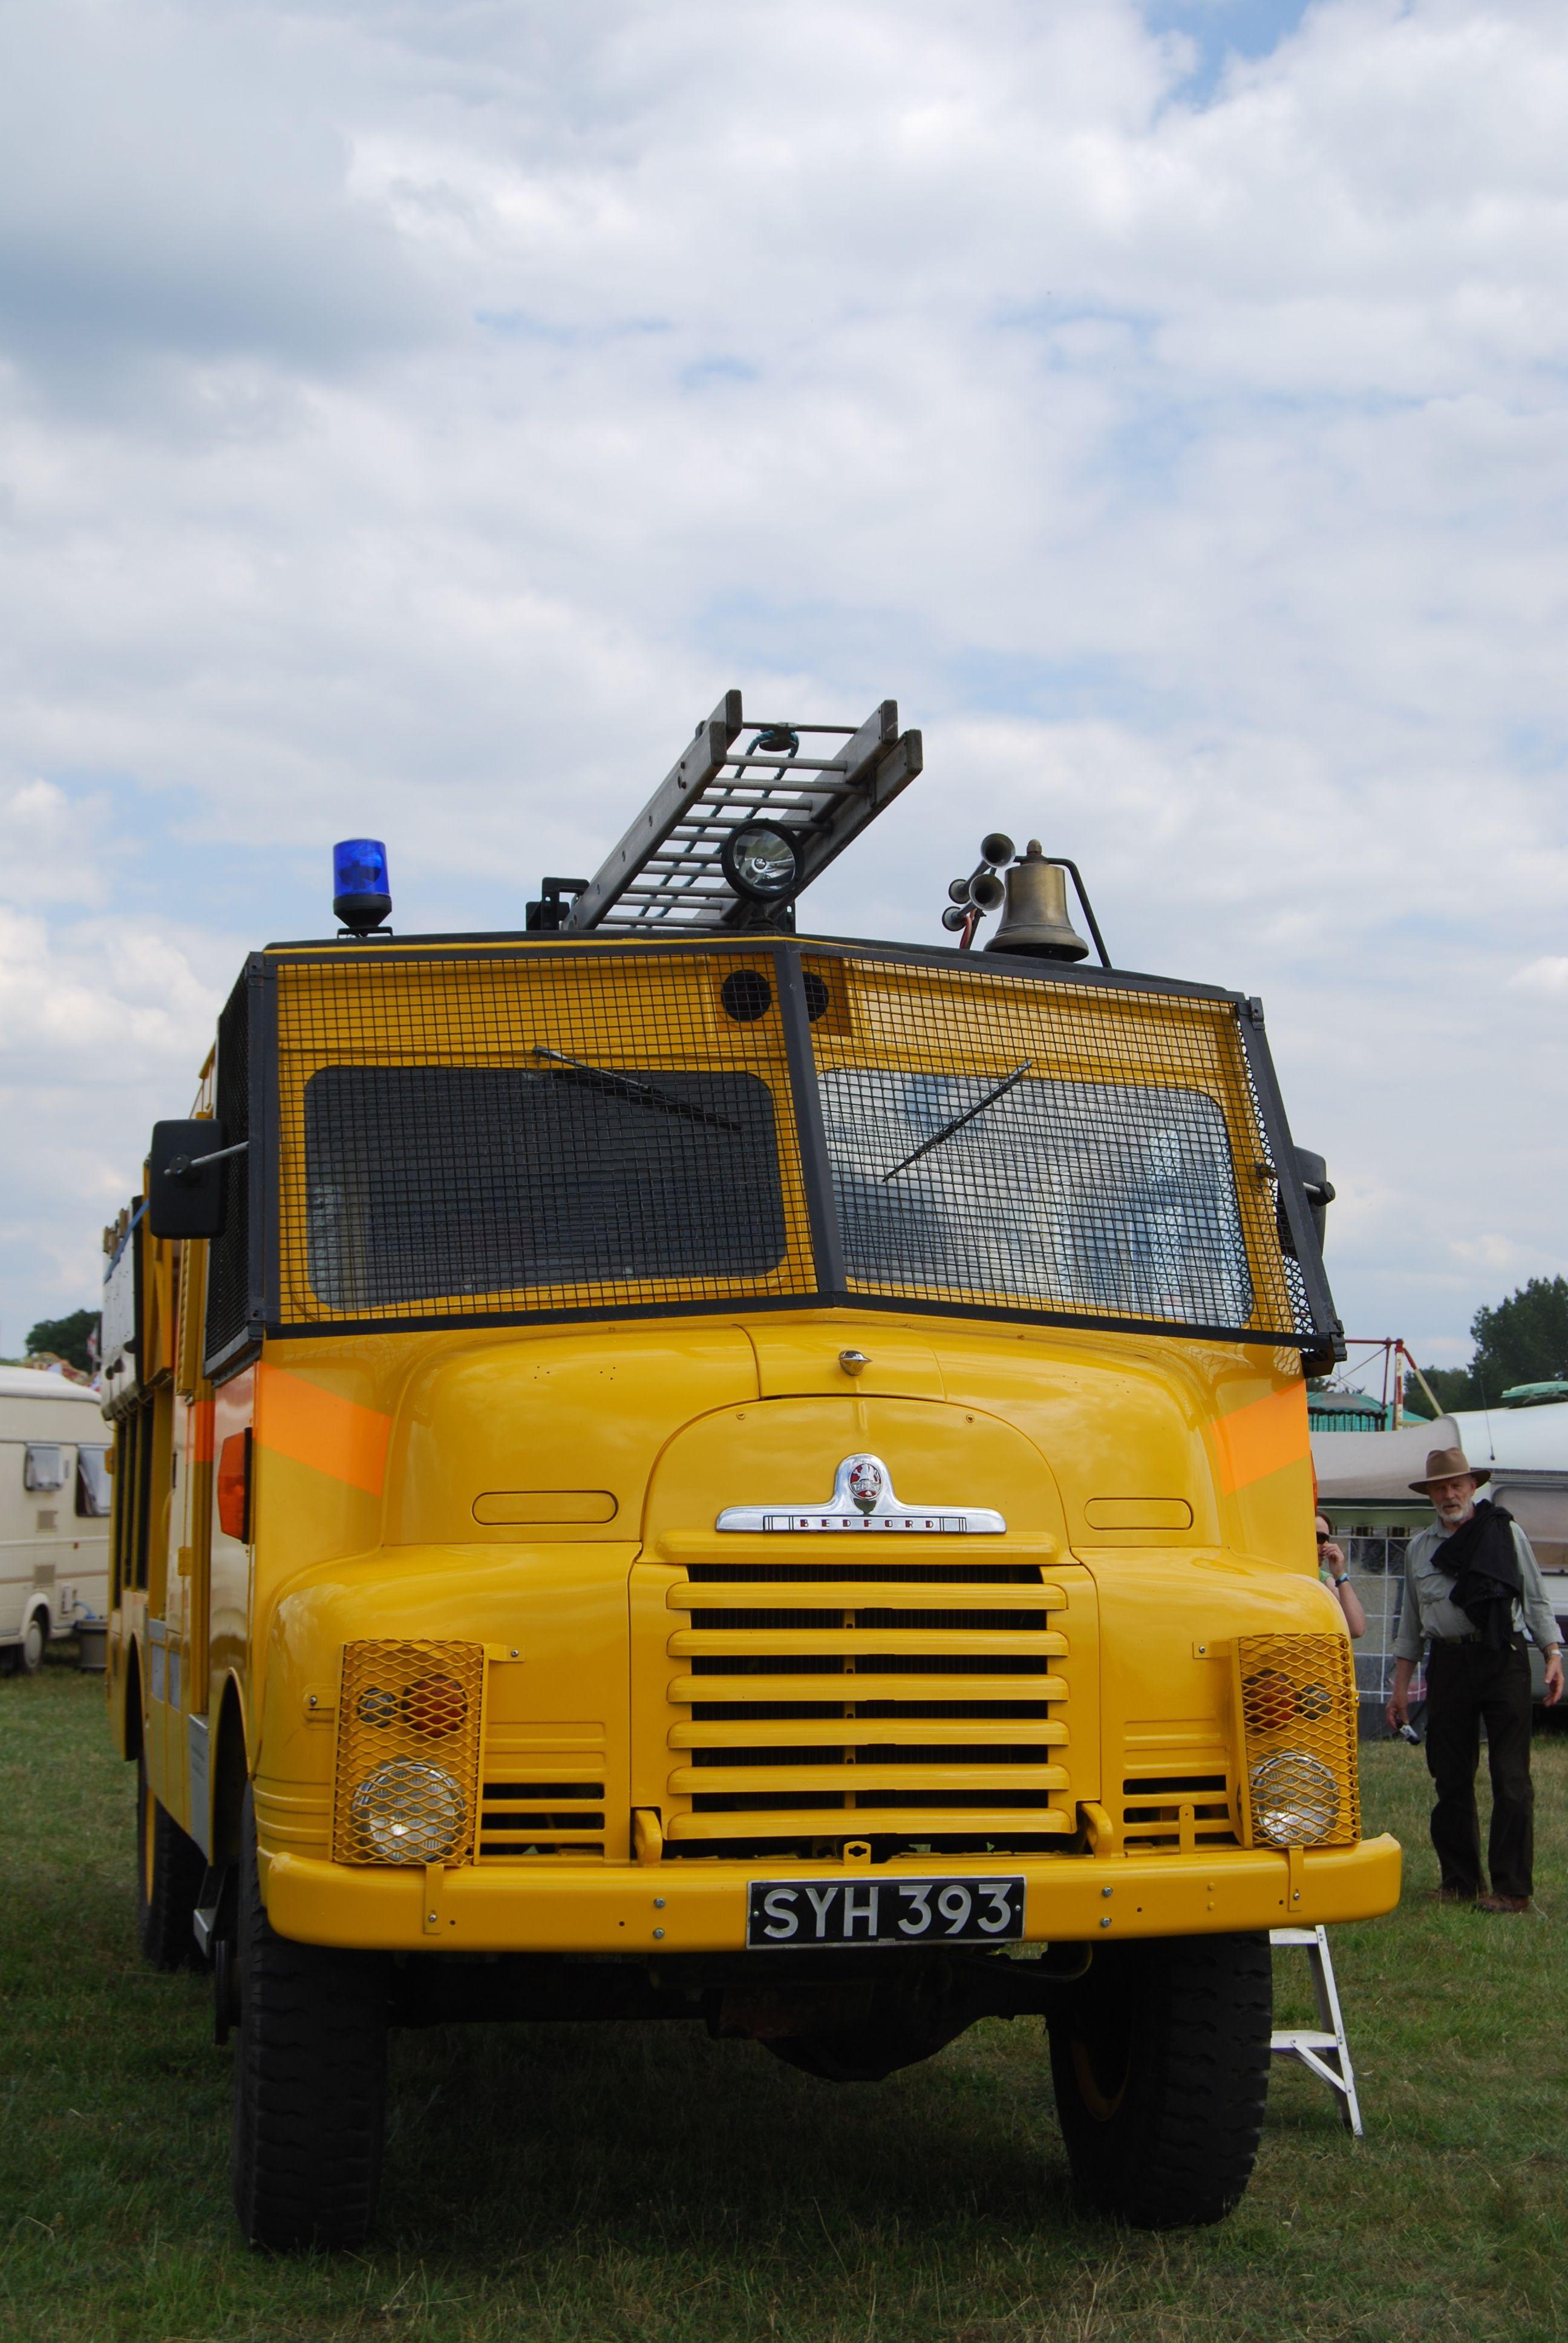 Bedford Emergency Pump (Yellow Goddess) Reg. No. SYH 393